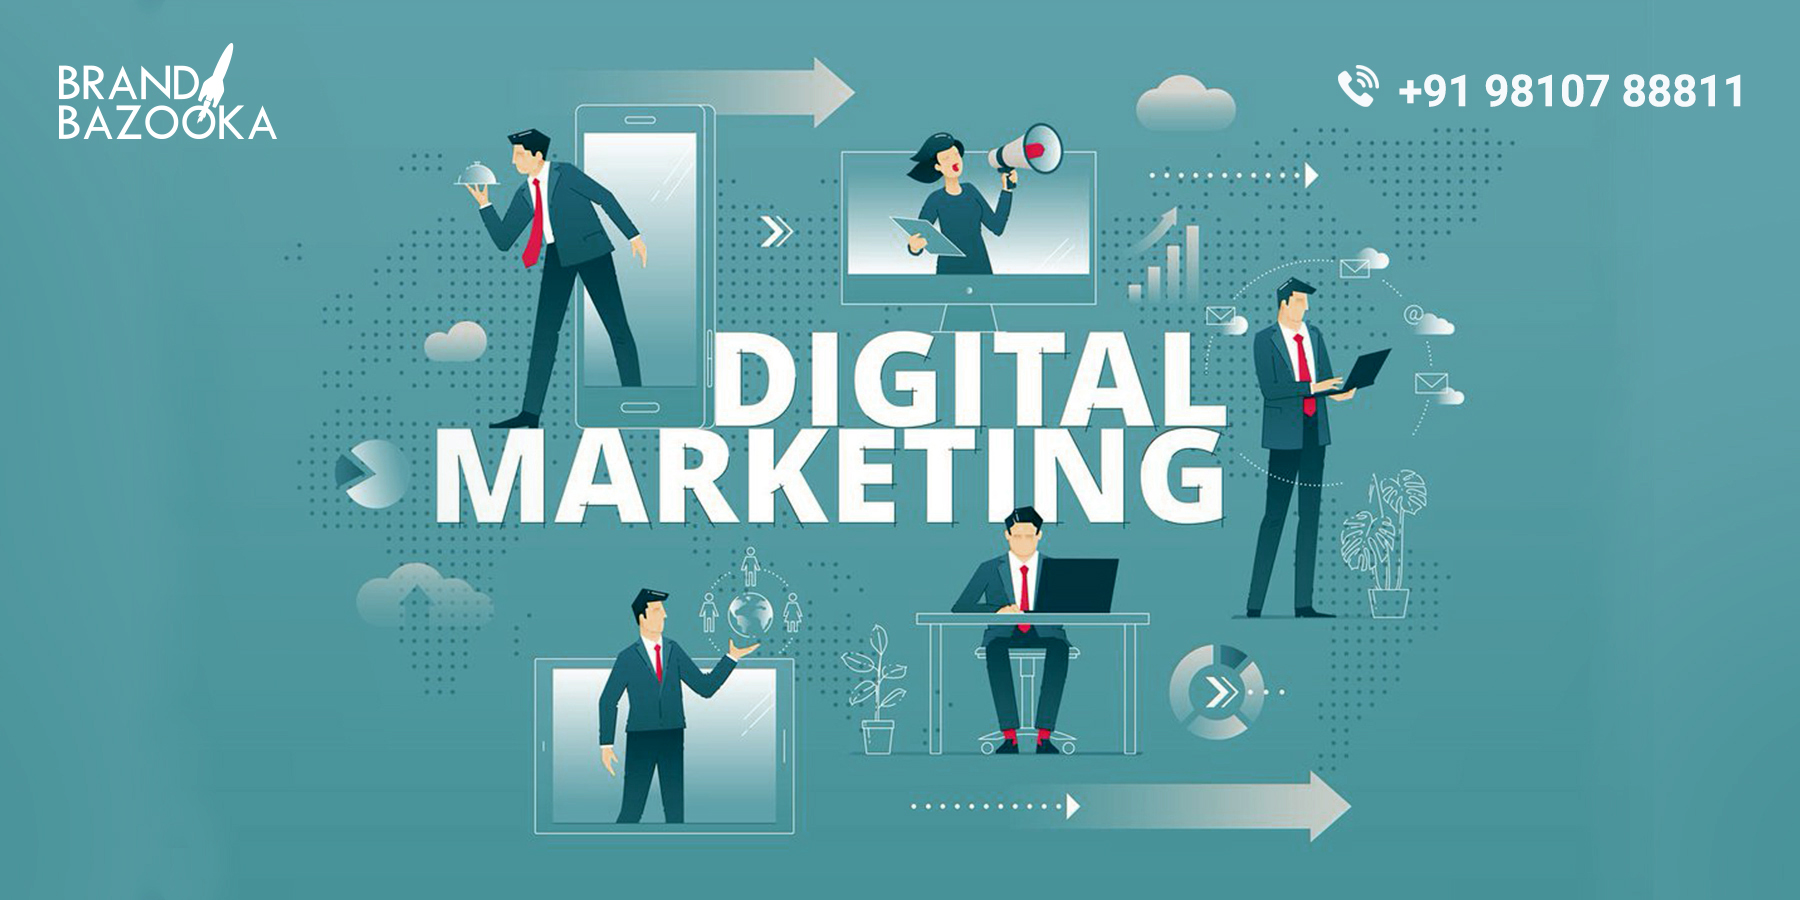 Excellent Digital Marketing Agency~ Brand Bazooka